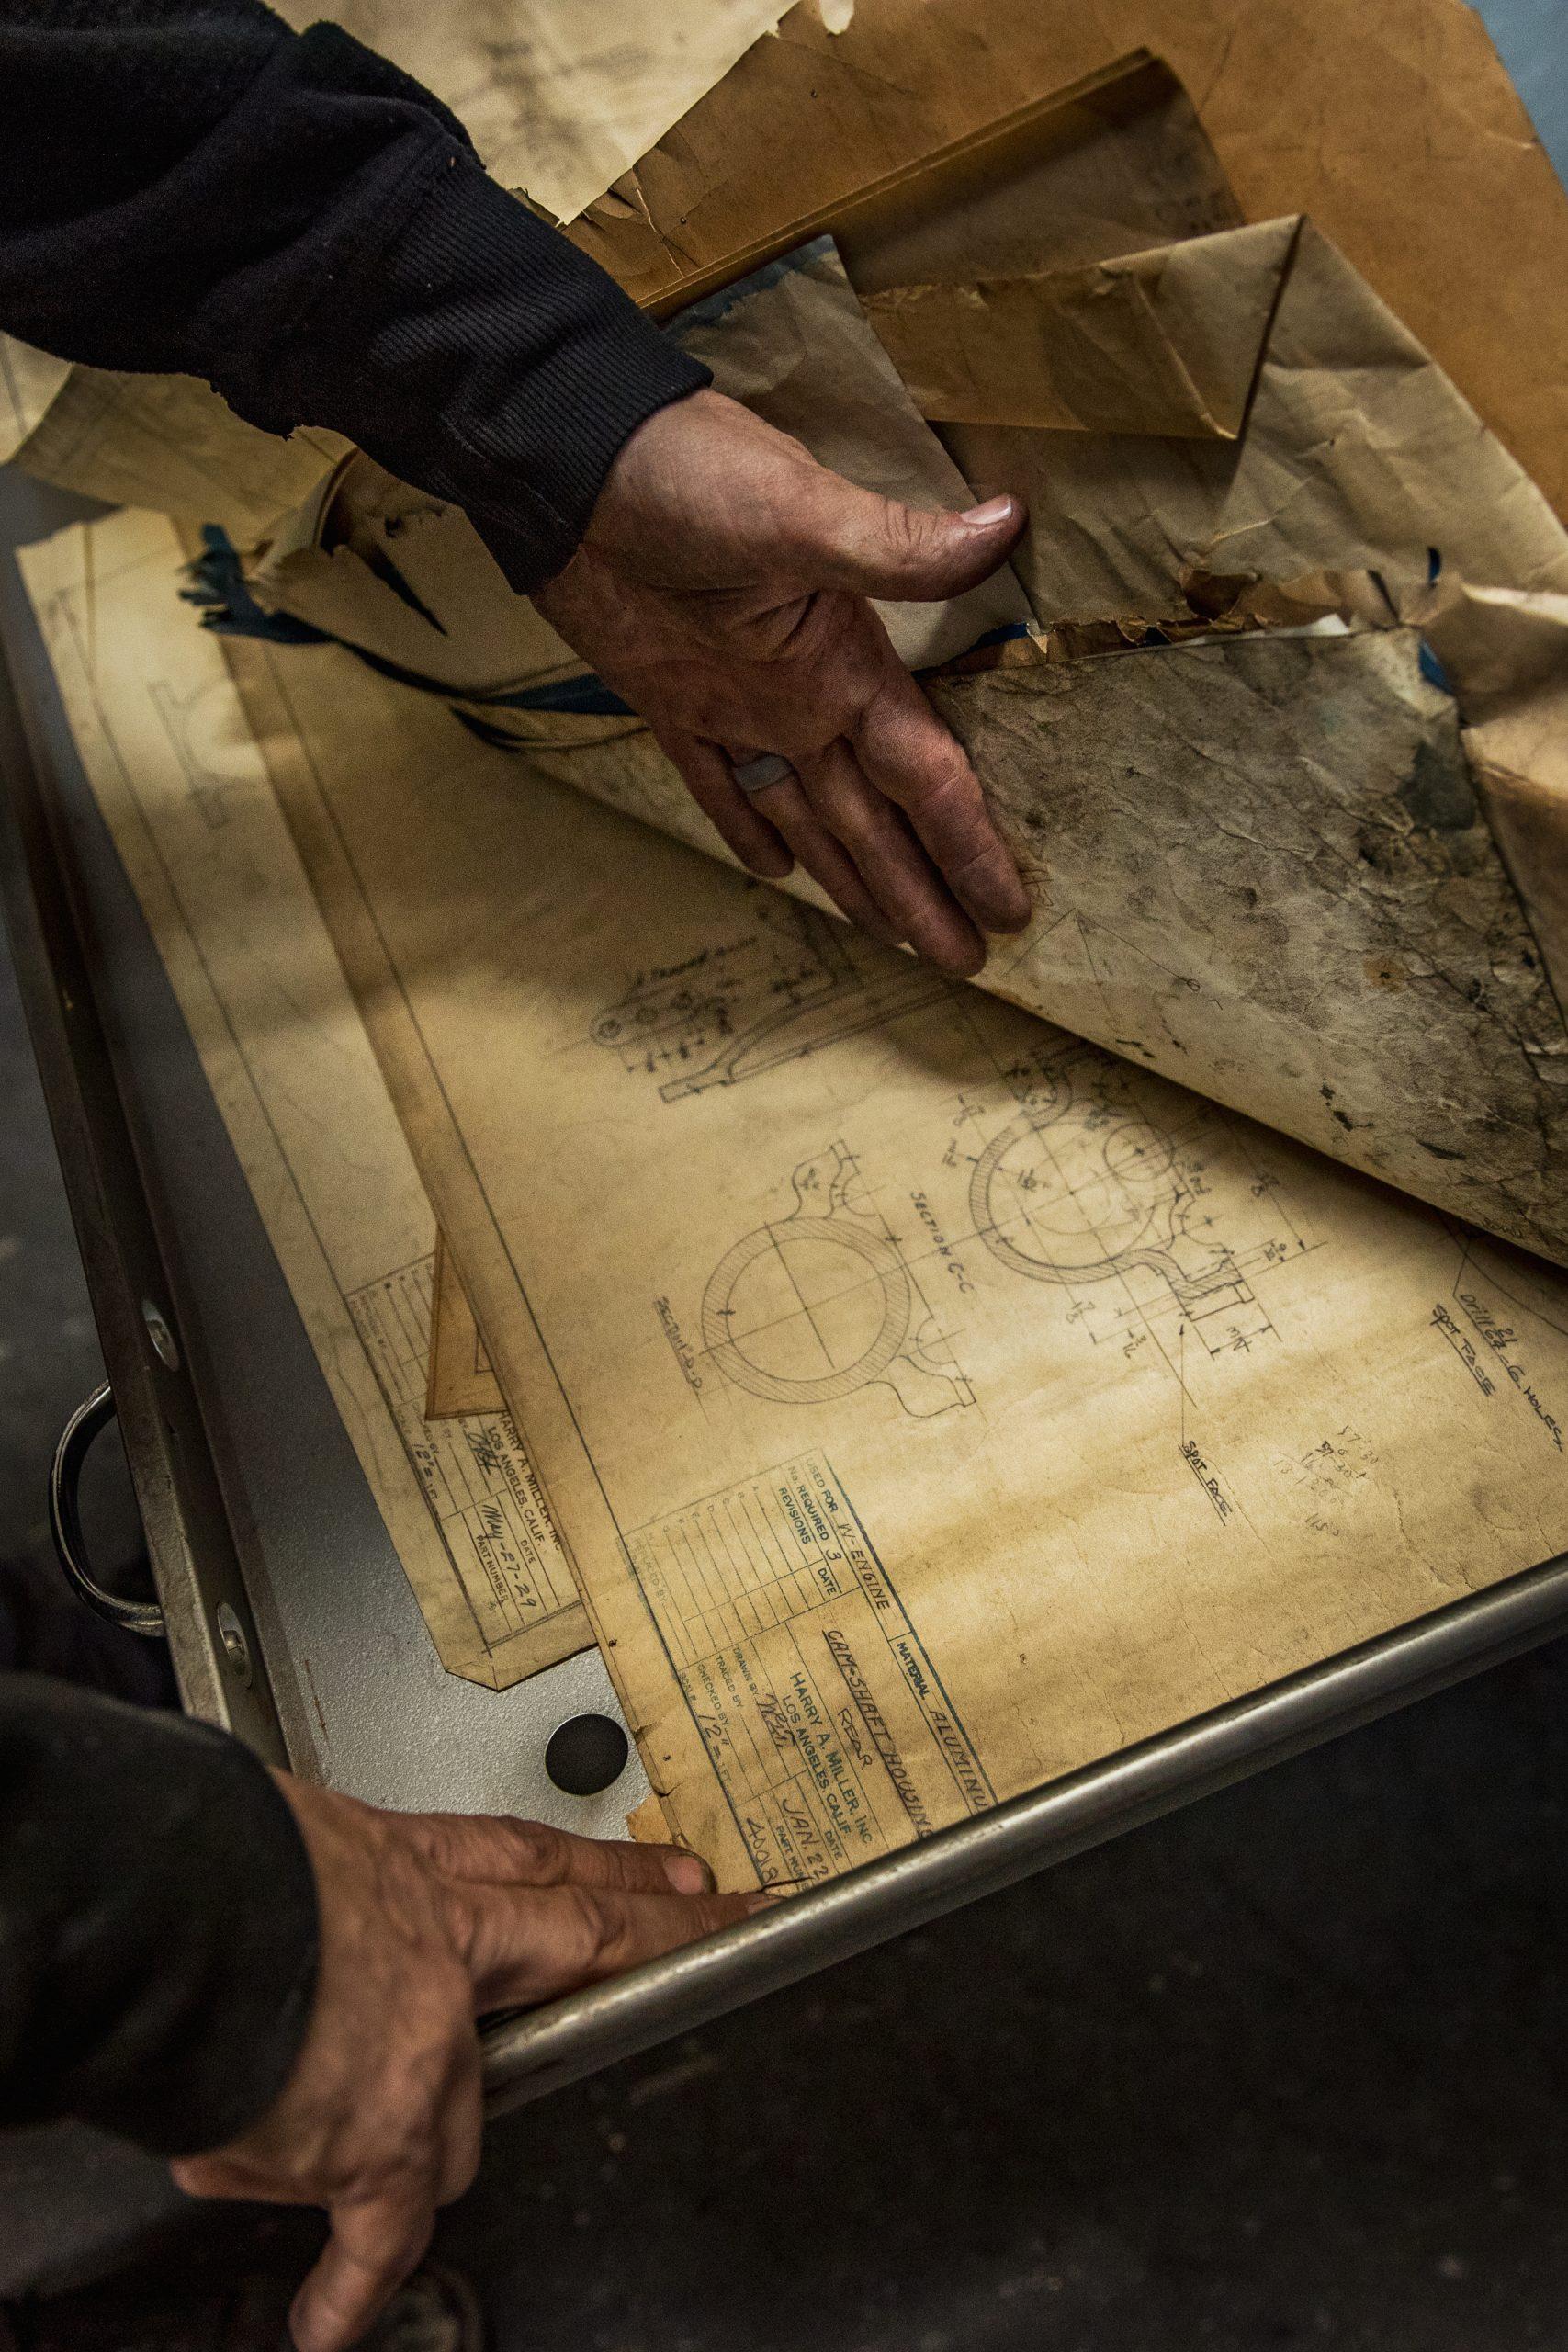 machine shop schematic drawings